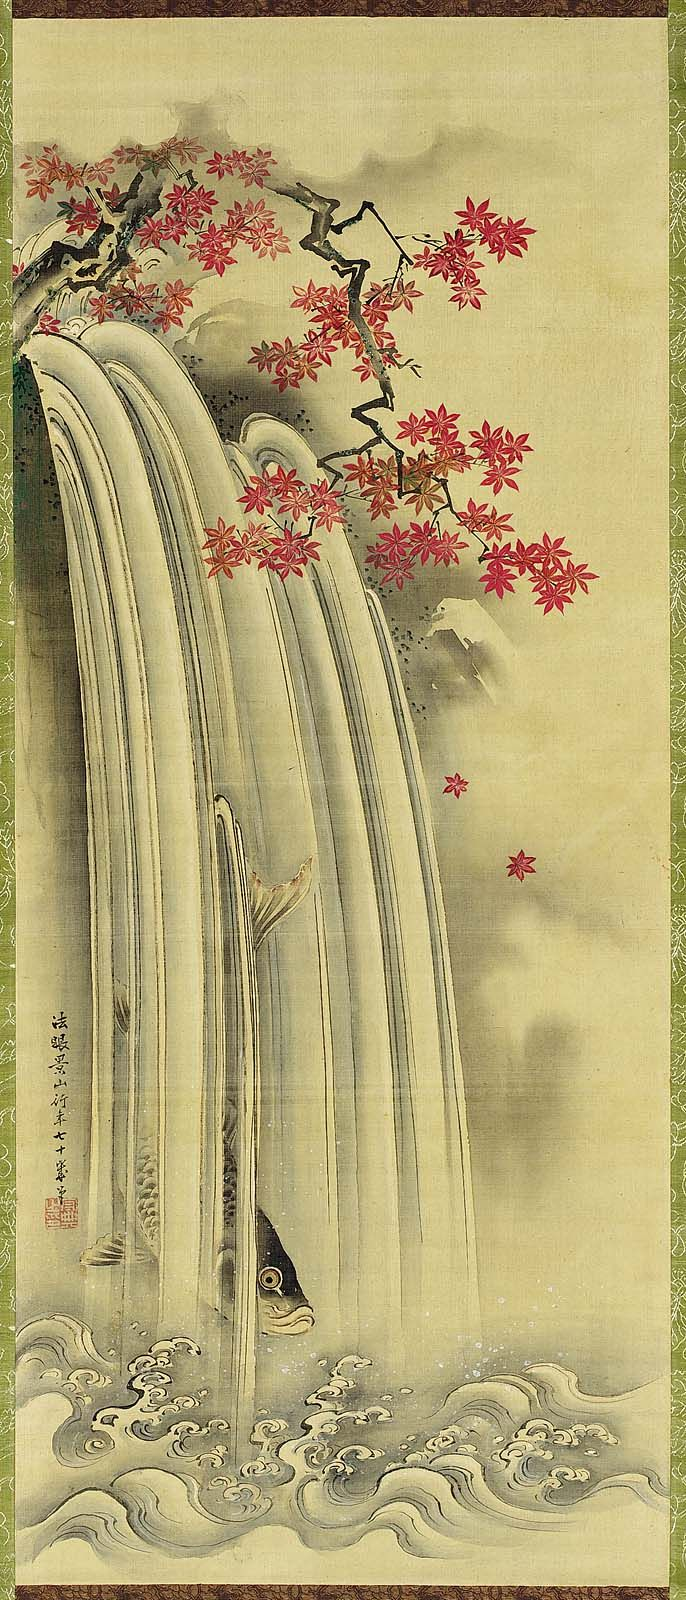 Carp and Waterfall with Autumn Foliage  Japanese mid to latter half of the 18th century Koshiba Keizan